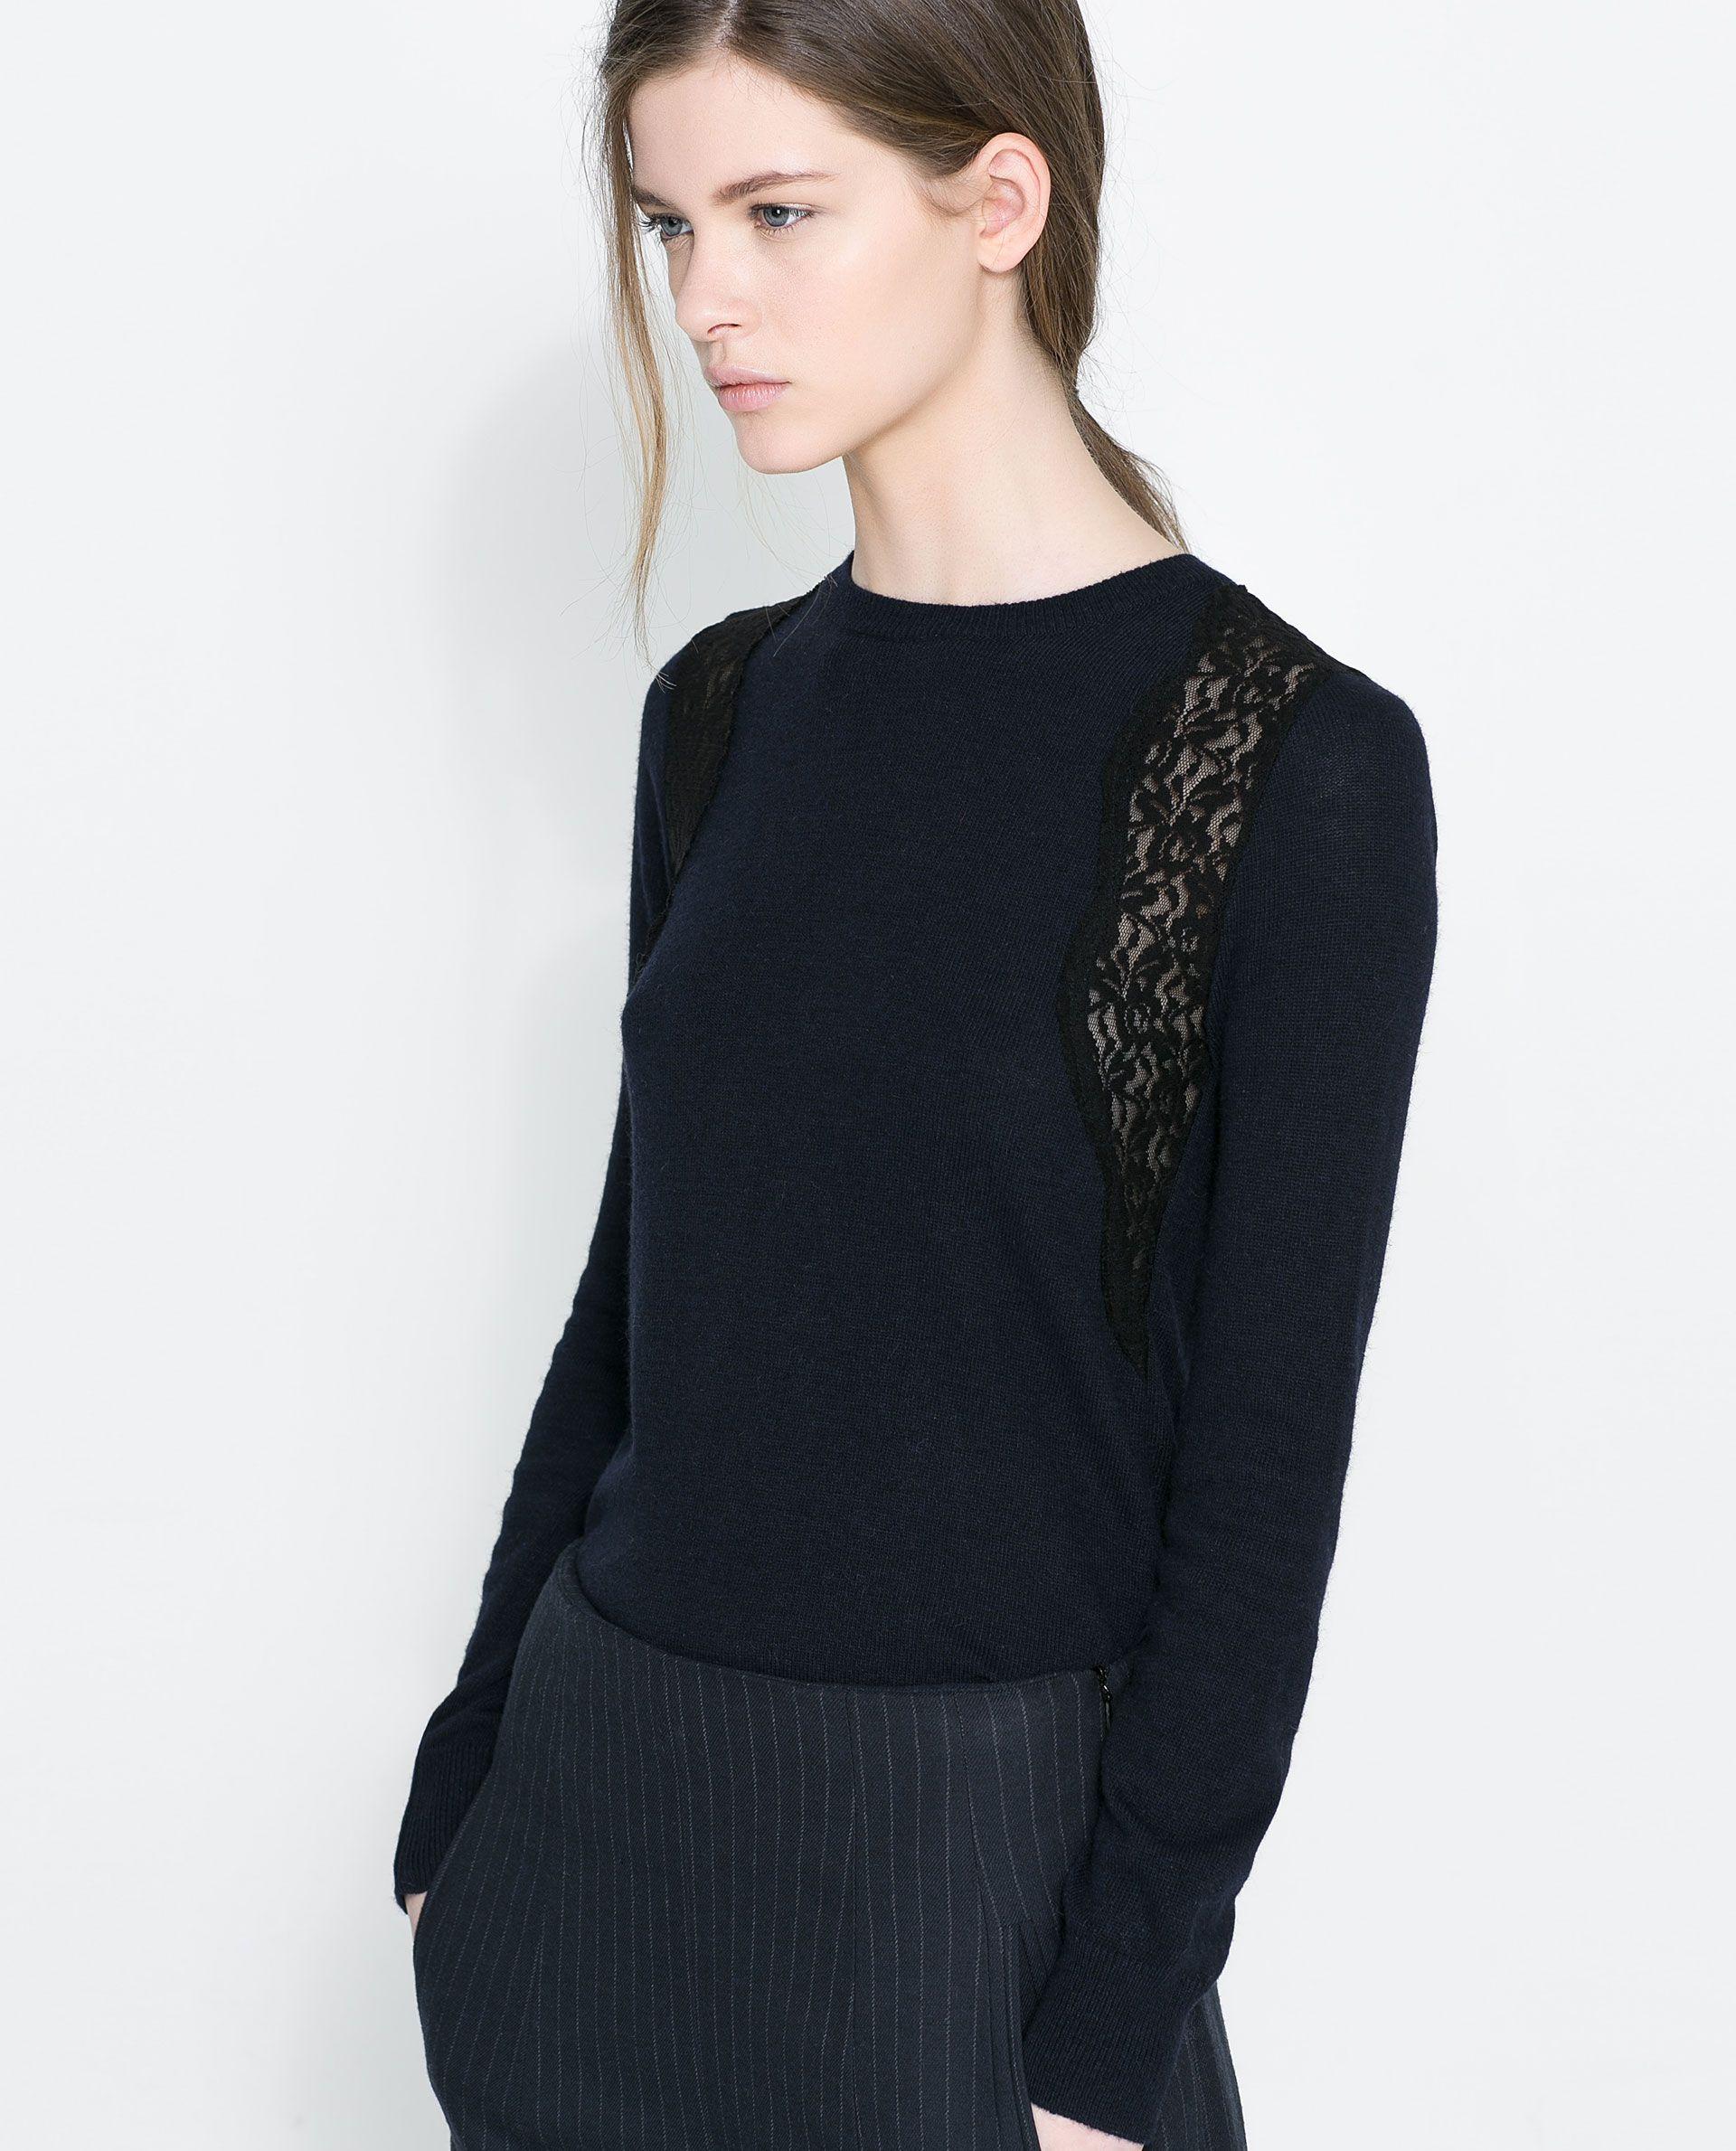 b606a60574 ANGORA AND LACE SWEATER - Knitwear - WOMAN   ZARA Ukraine   Zara ...